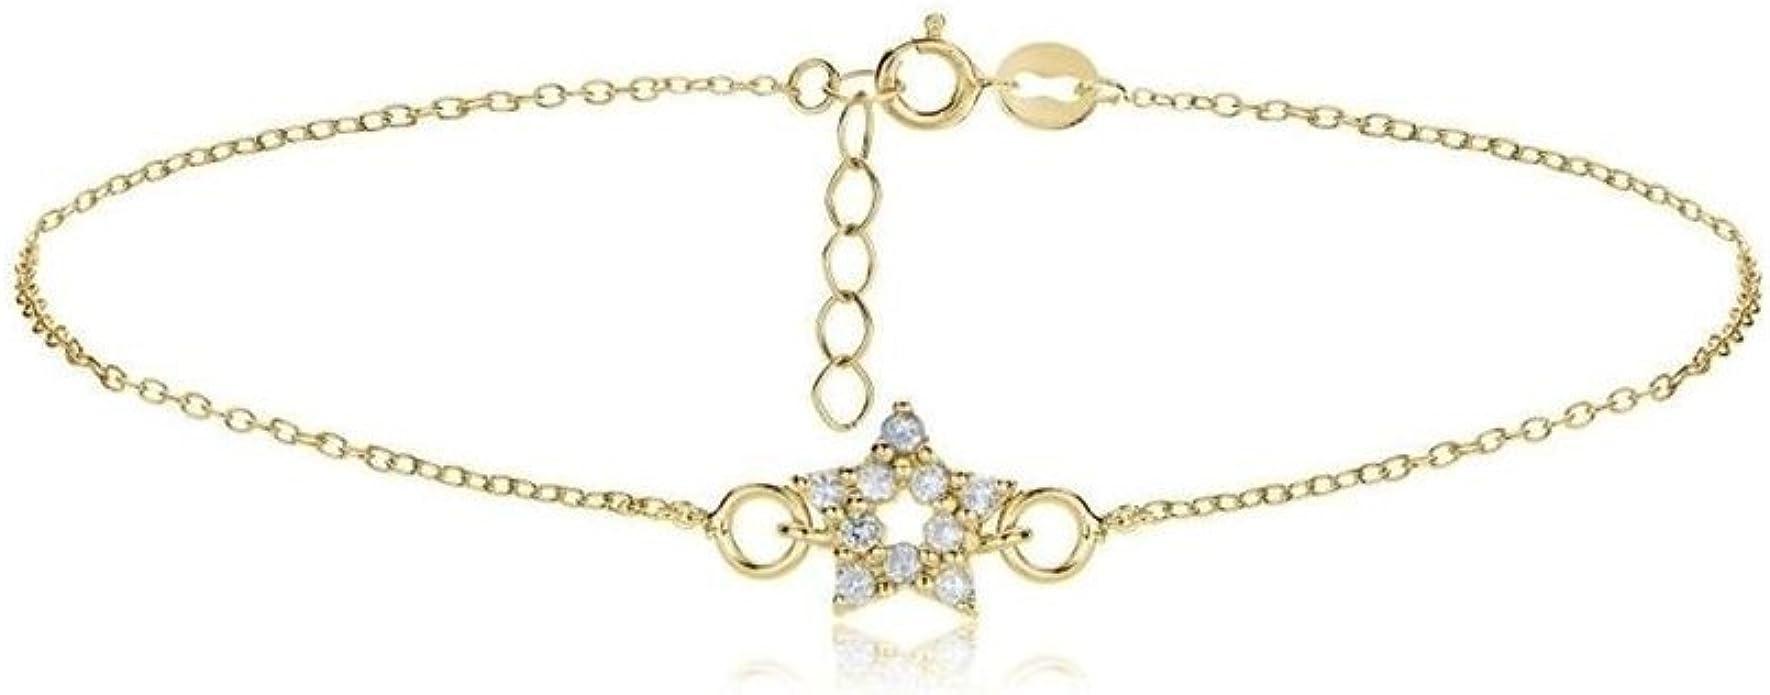 Glitzs Jewels Sterling Silver Cubic Zirconia Star Chain Anklet